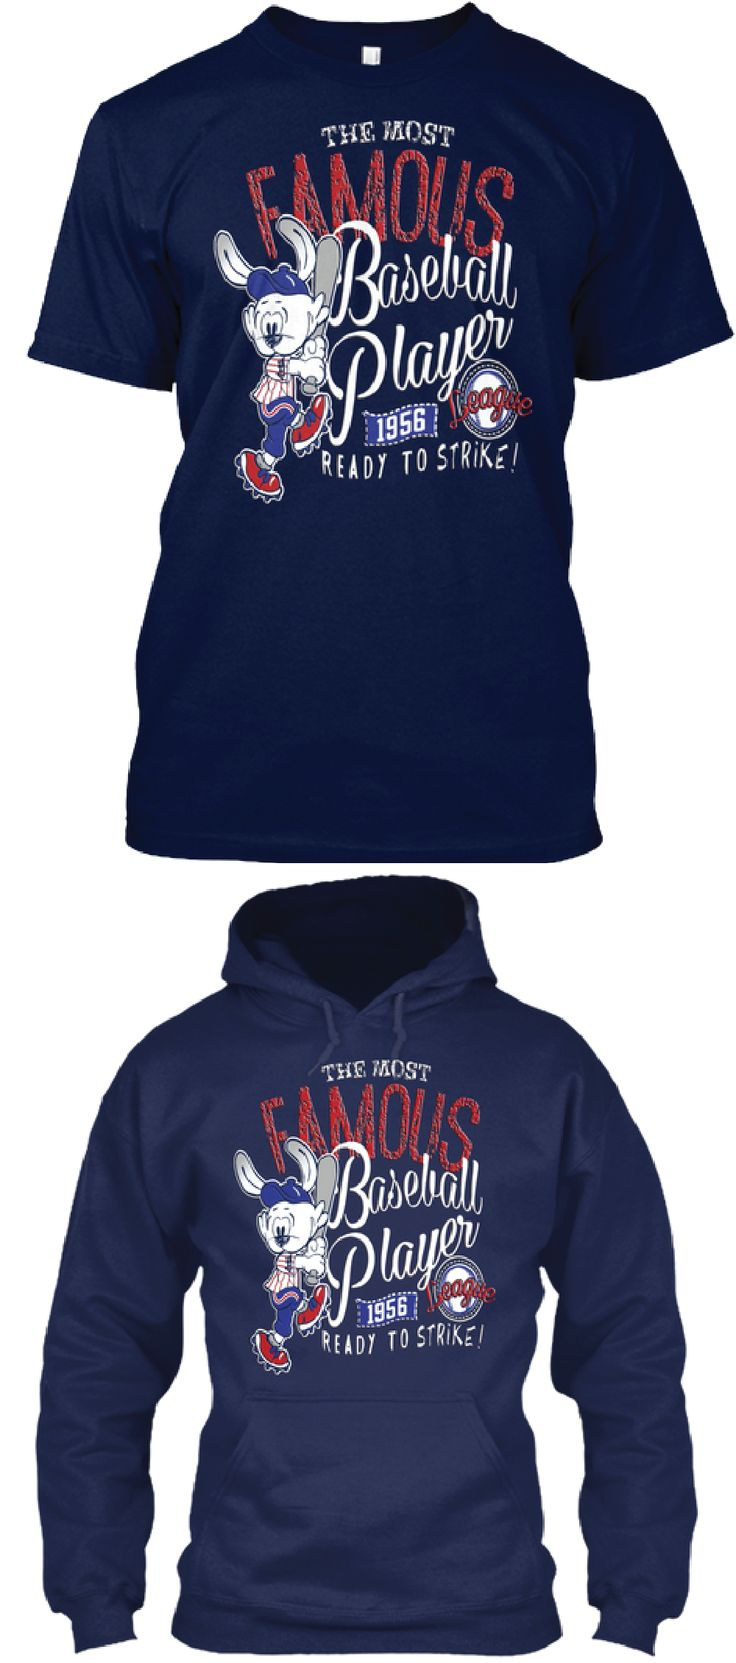 The most famous baseball player #t-shirt, #shirts, #sweater, #sweatshirt, #hoodie, #player, #baseballmom, #usa #team, #bats, #balls, #mlb, #champion